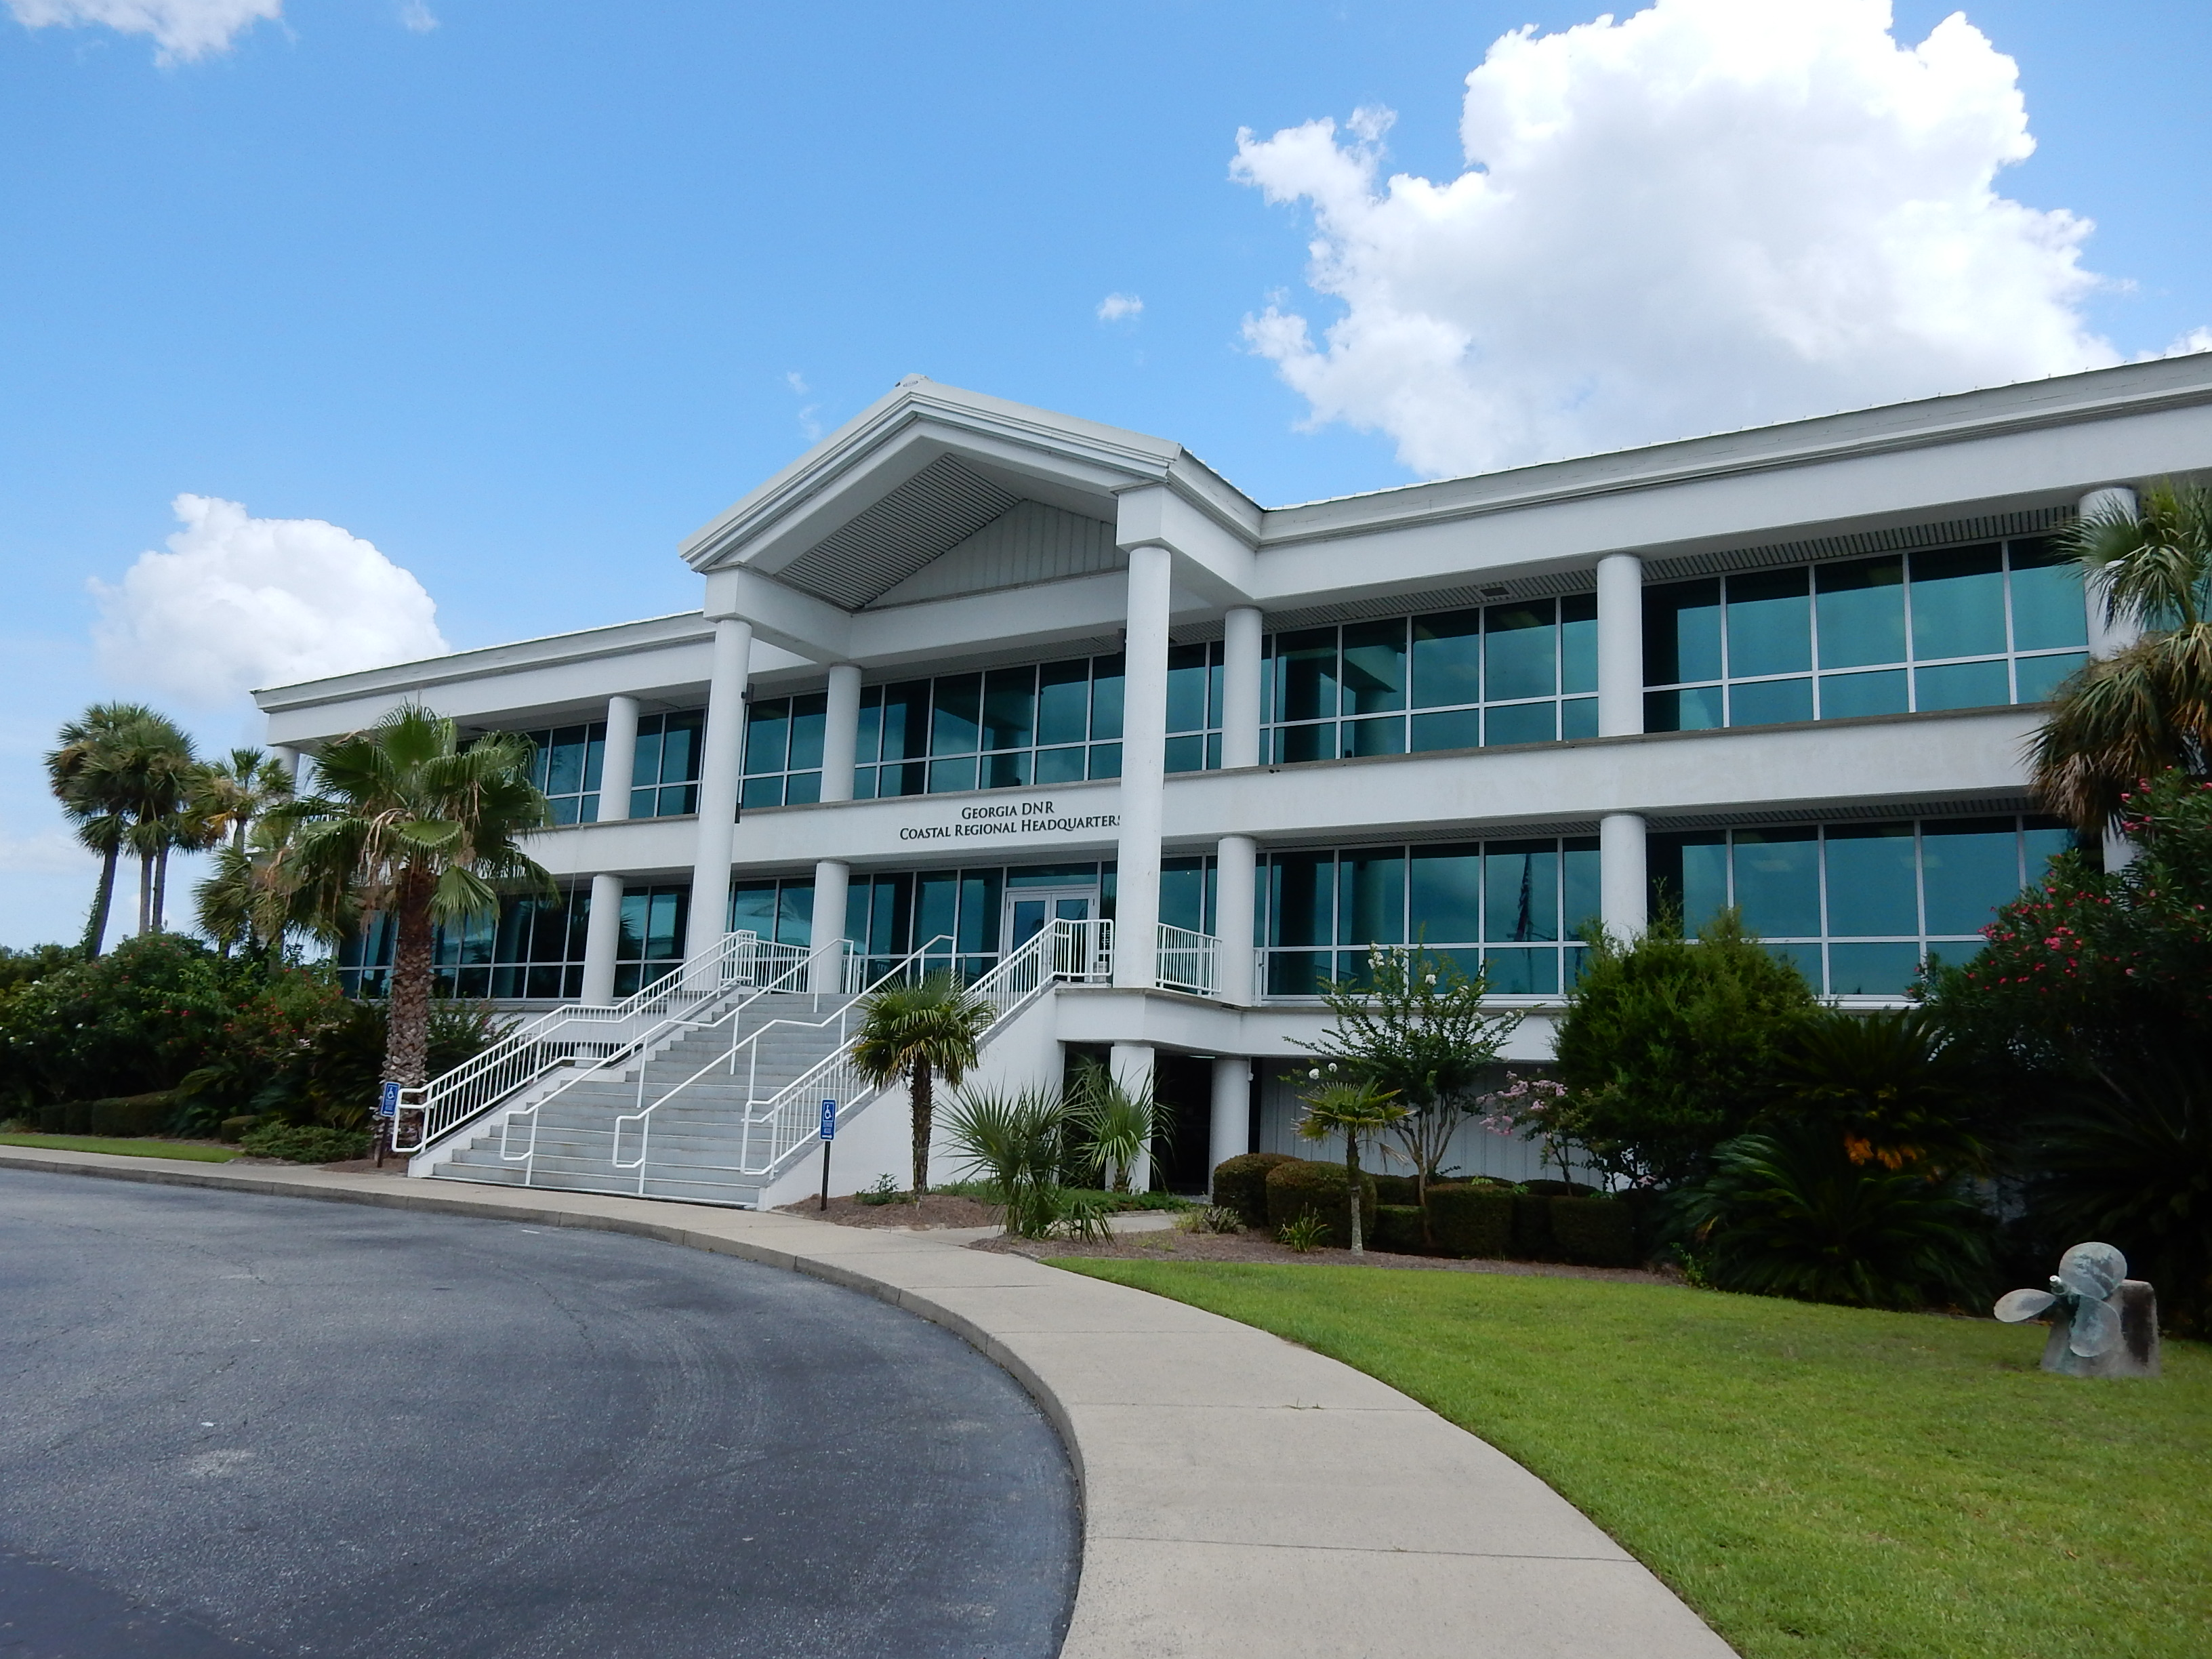 Photo of Coastal Regional Headquarter building